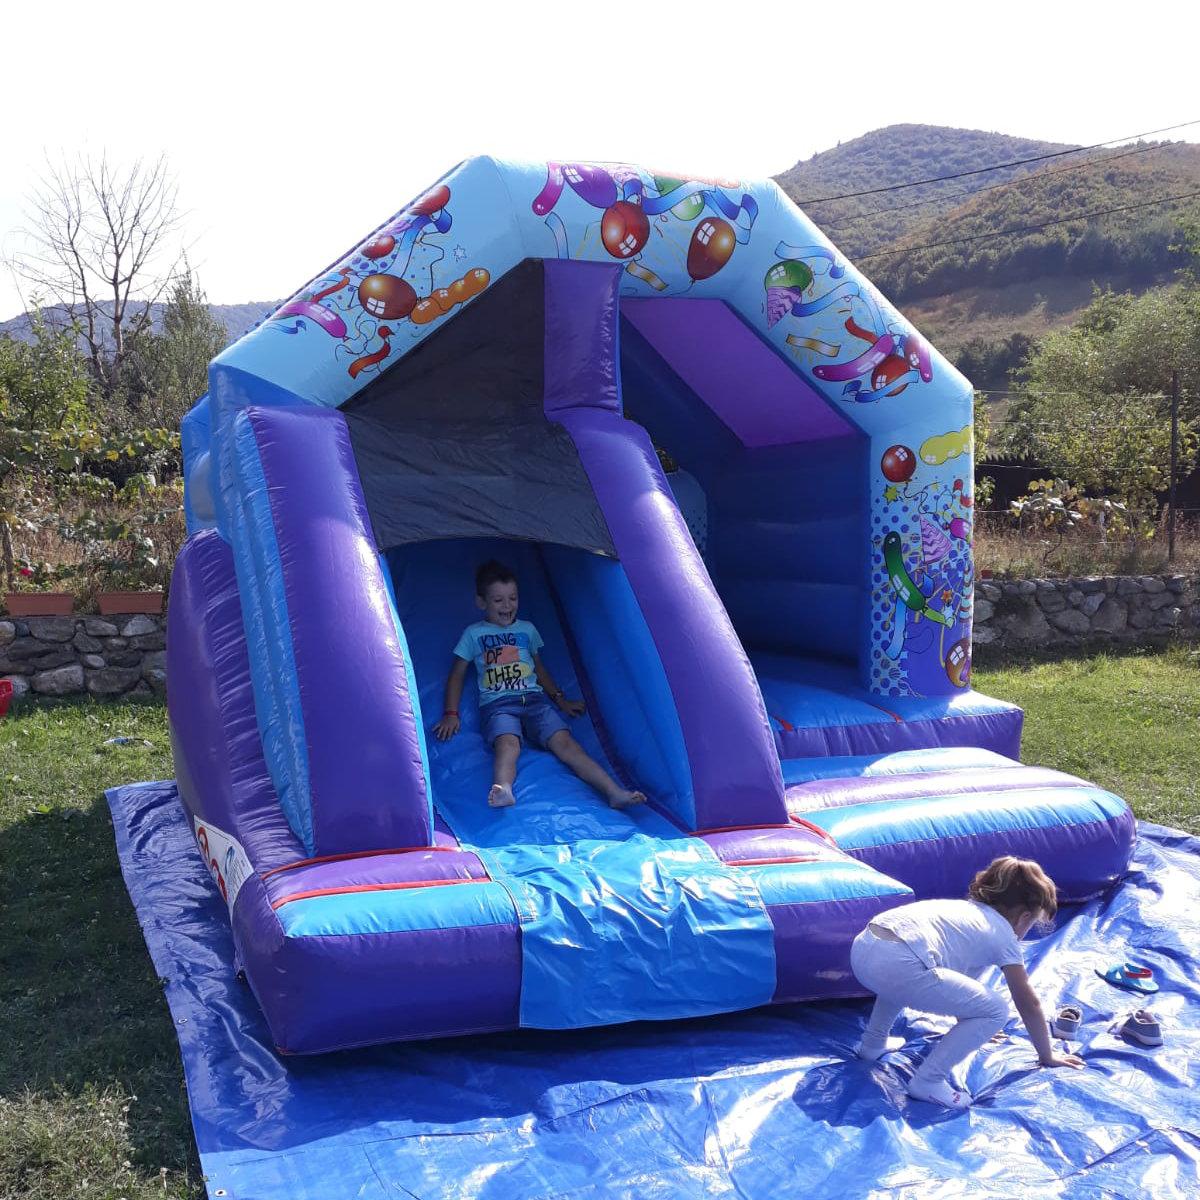 party-time-petreceri-copii-sibiu-gonflabila-tobogan-1